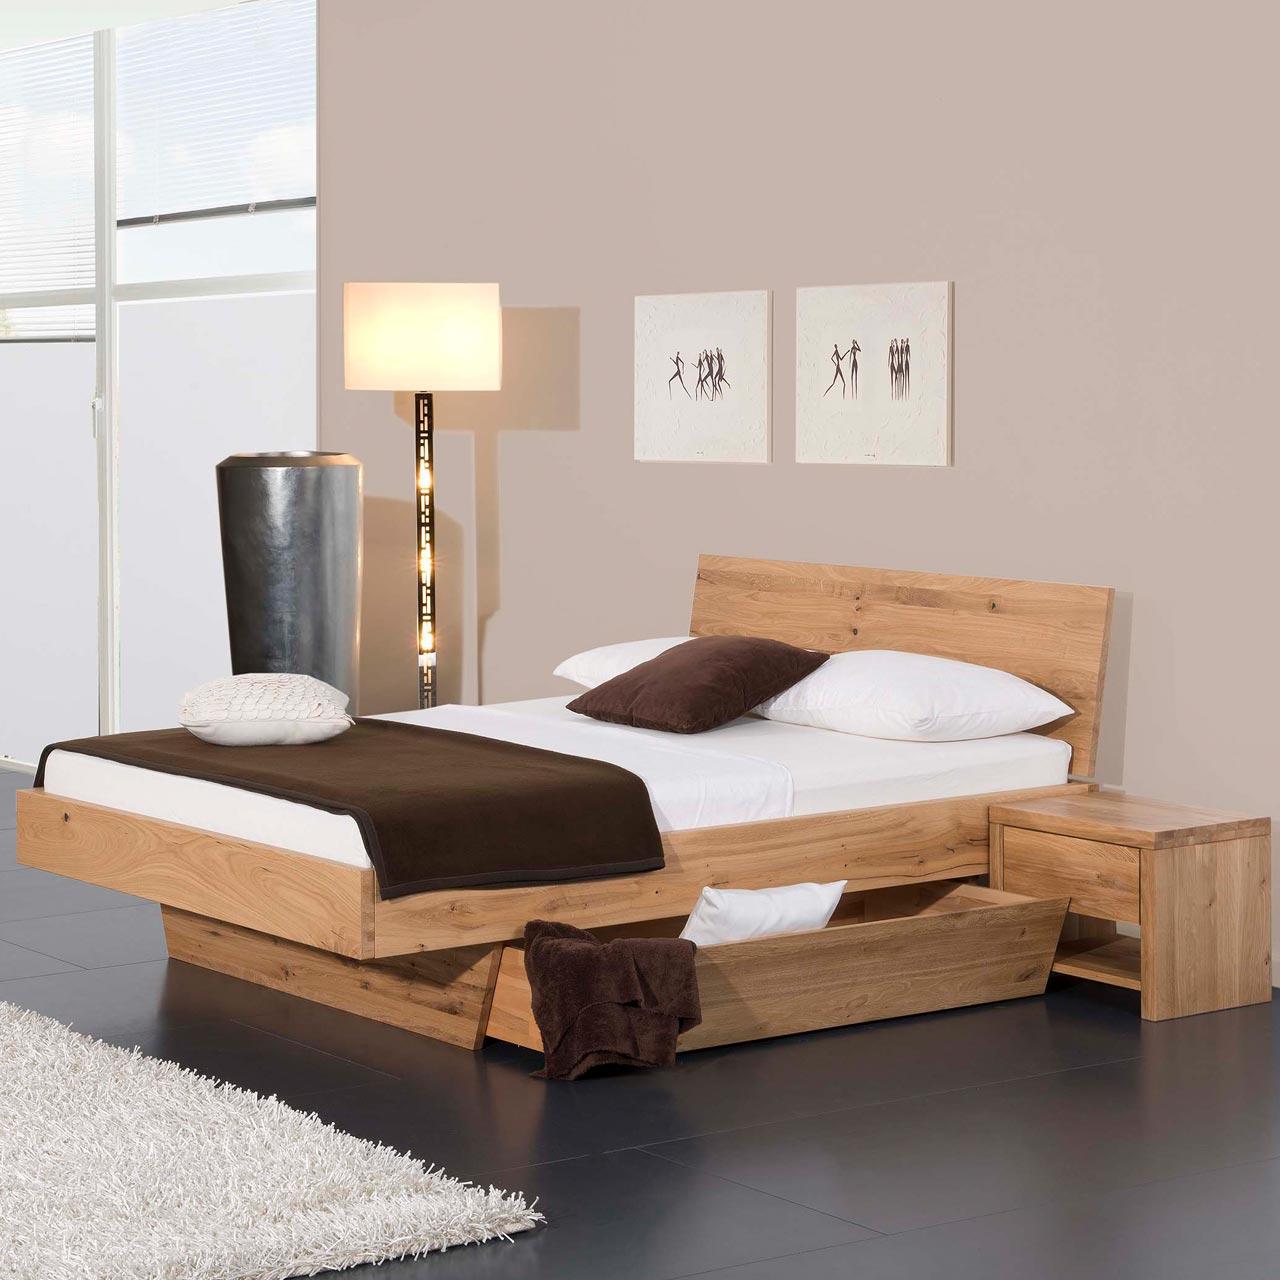 Full Size of Modular Massivholzbett Natura Plus Matino Mit Bettkasten Bett Betten.de